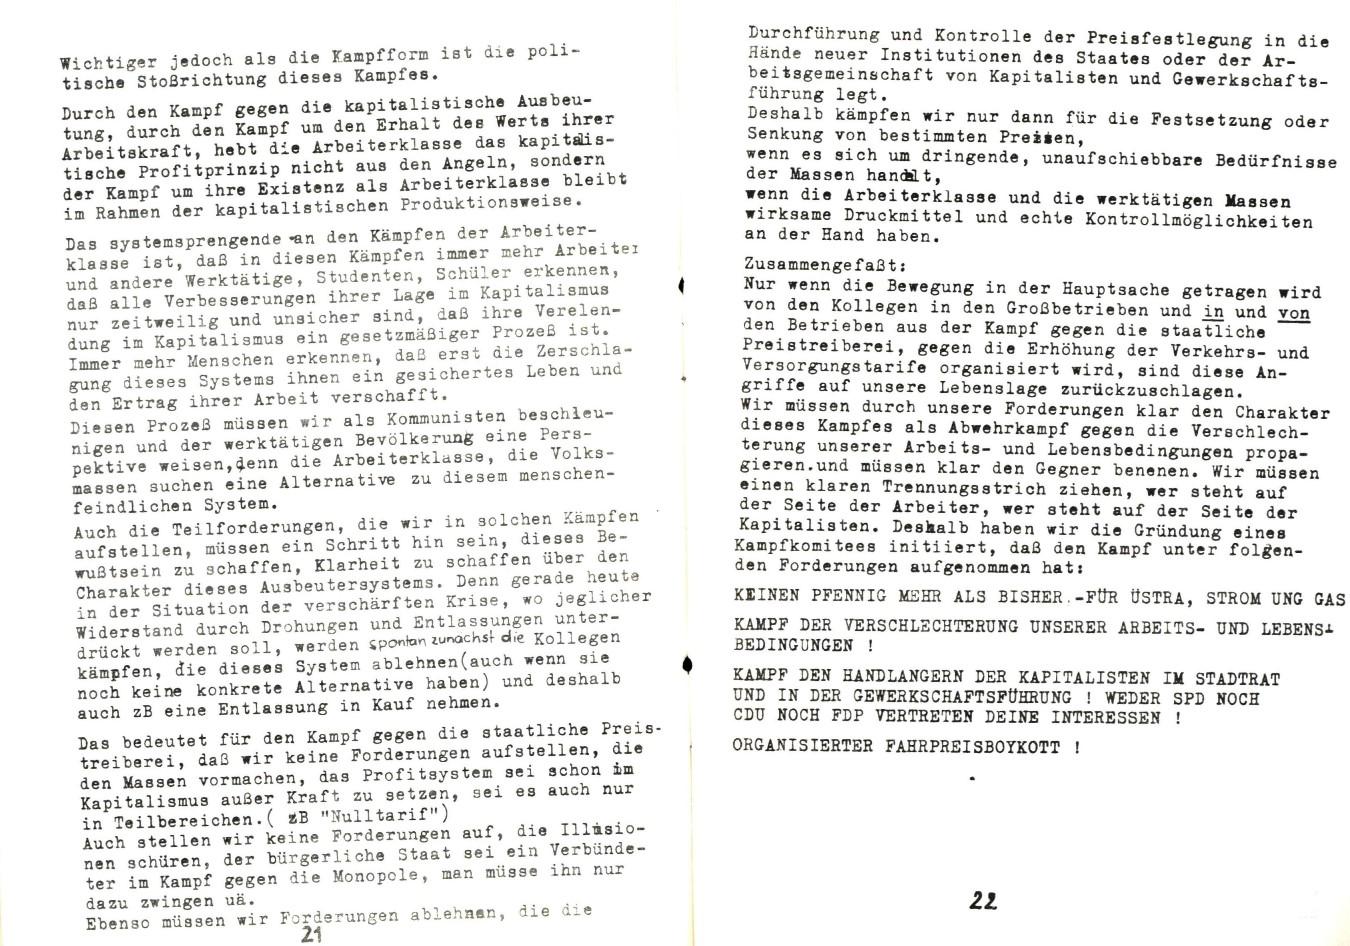 Hannover_AO_1975_Fahrpreisboykott_12